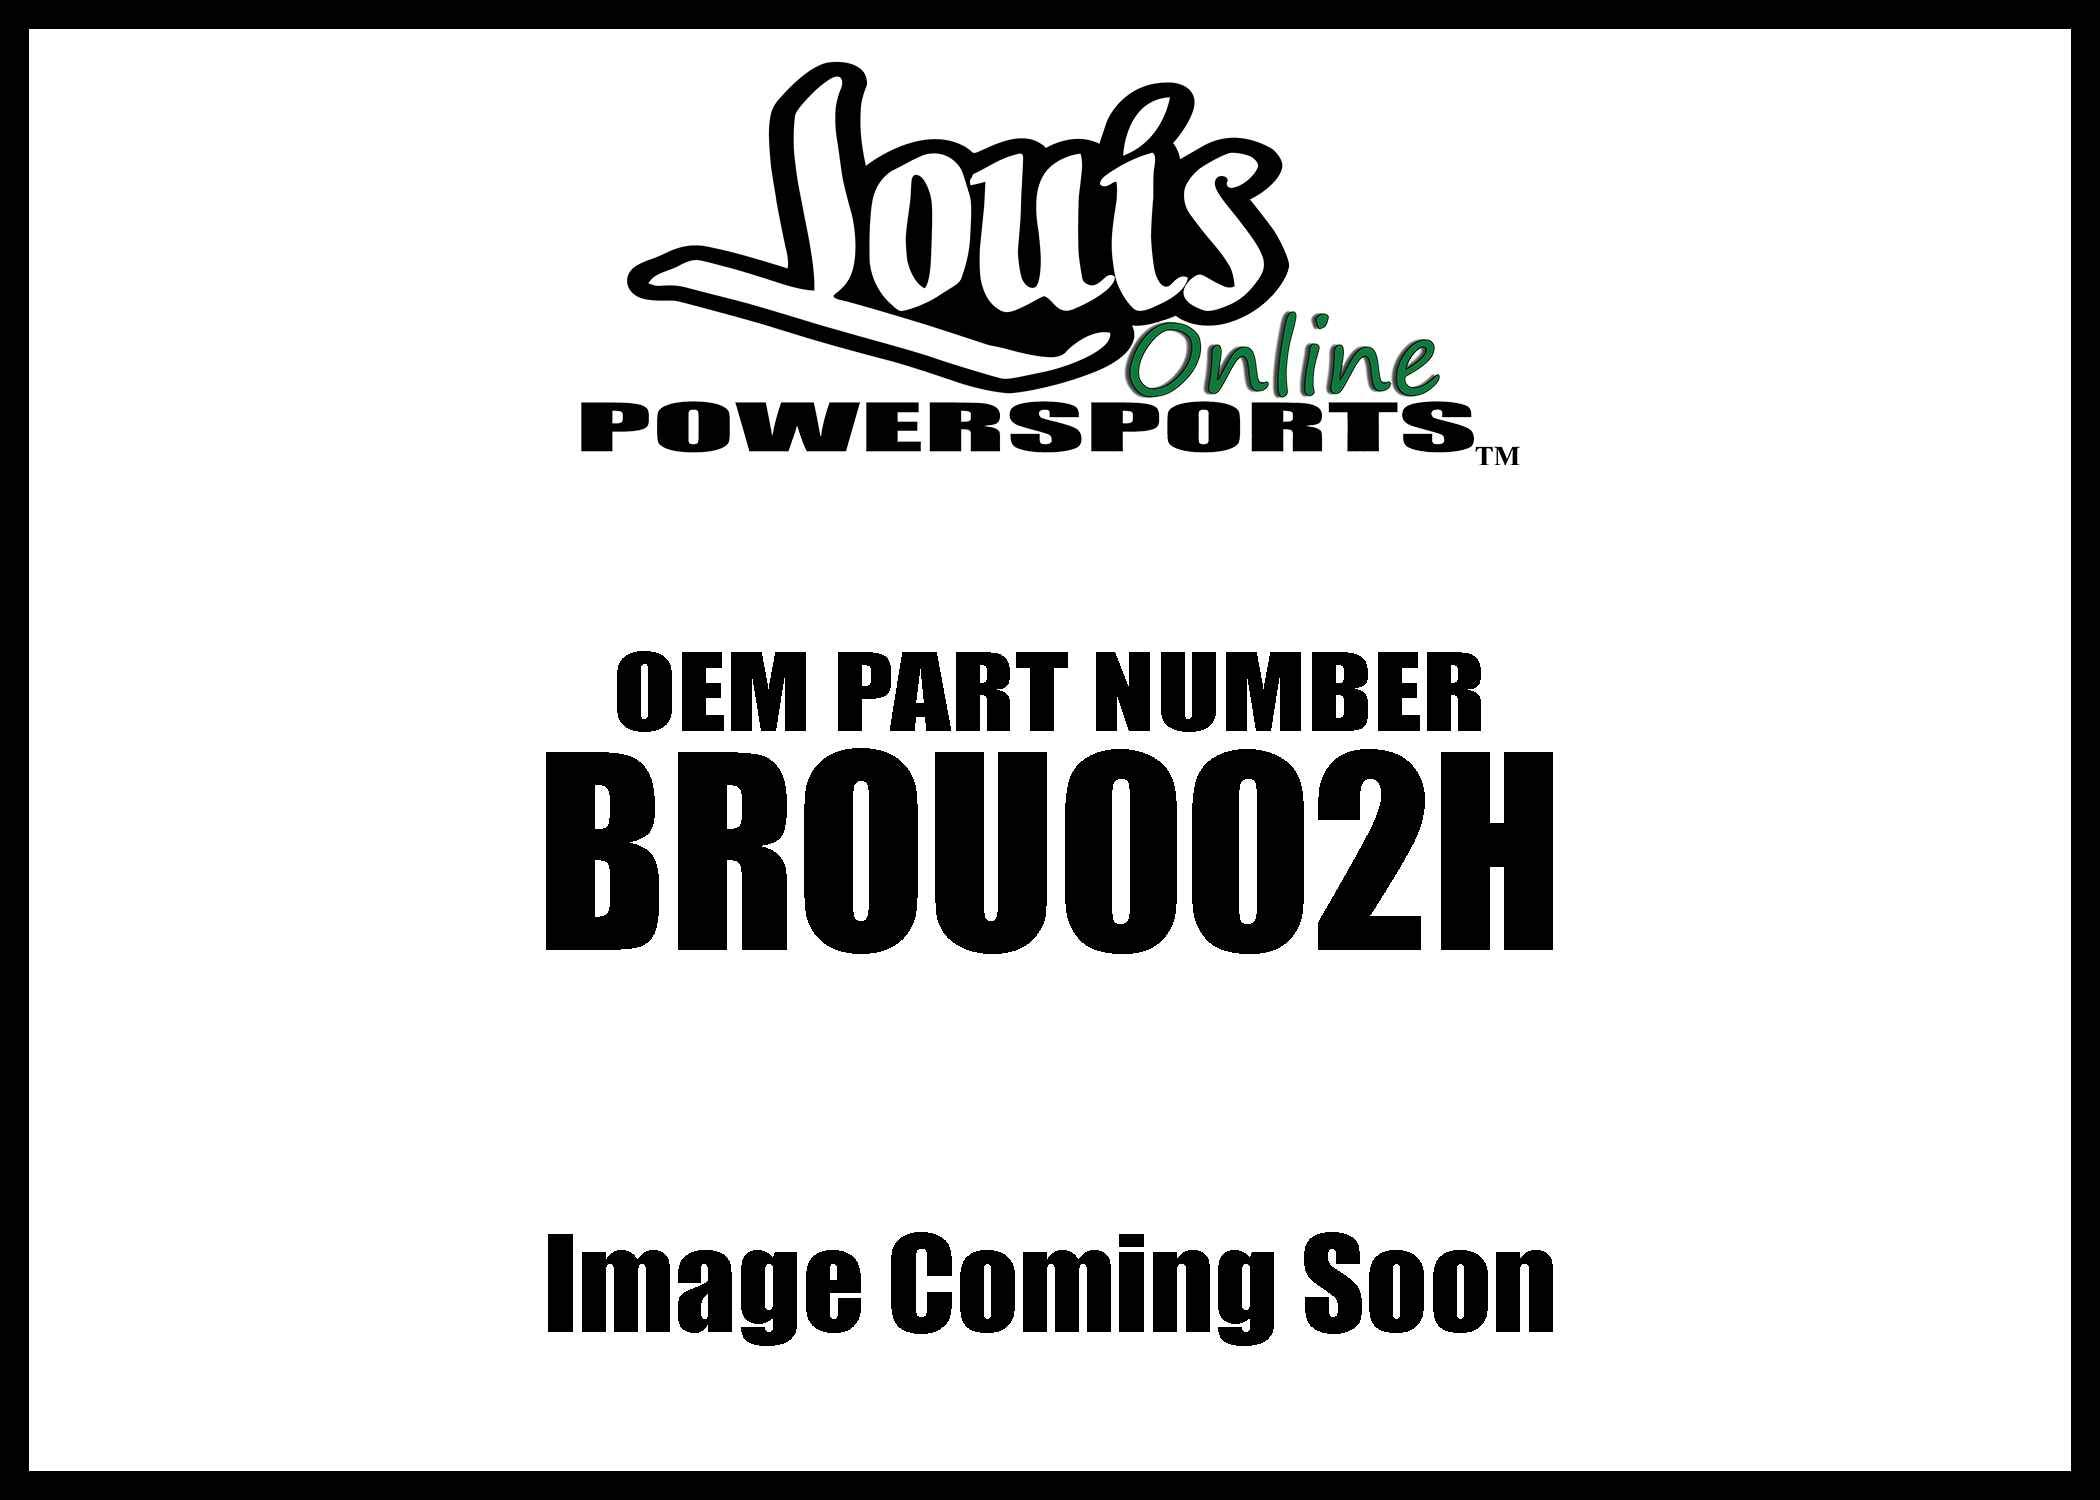 Bobster Eyewear Route Sgl Glbrn Tor Pur Hd Blu Brou002h New